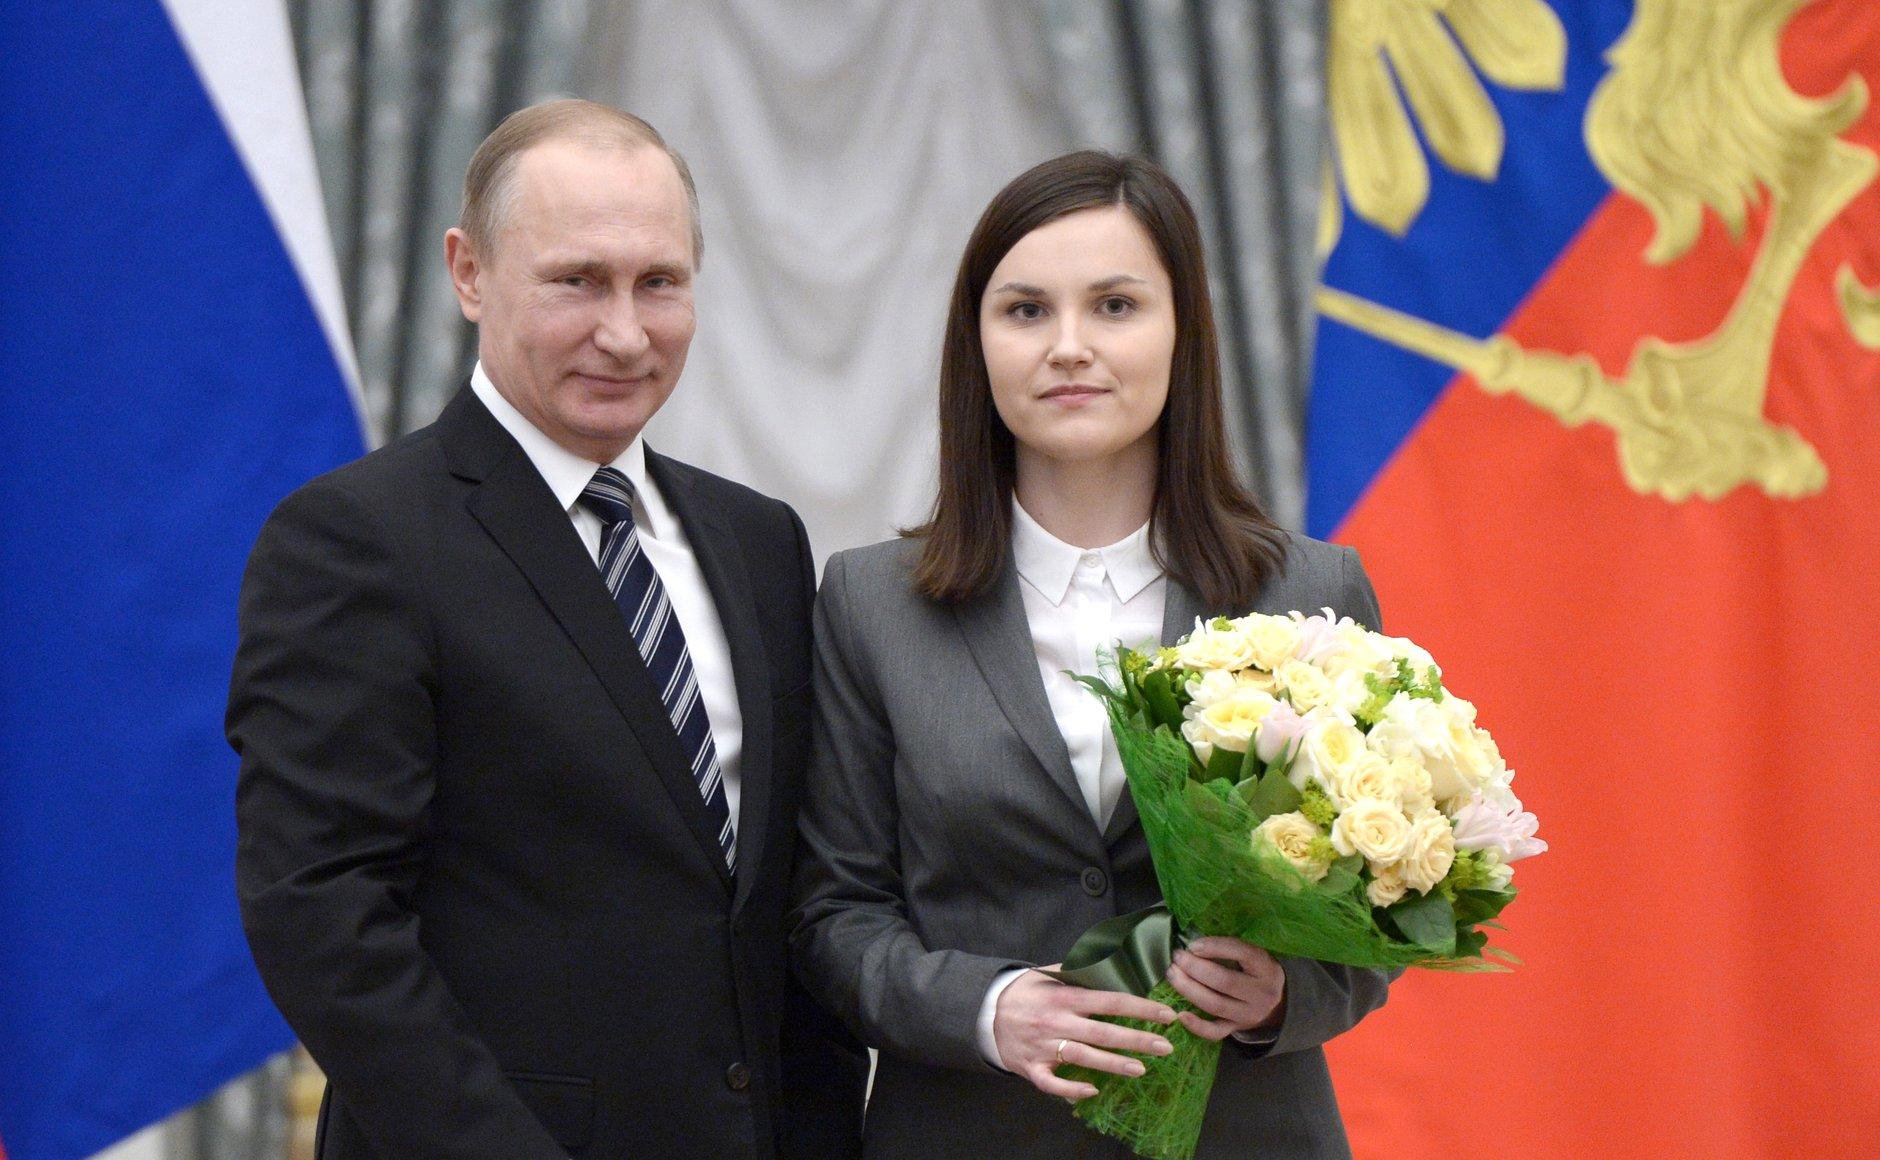 Владимир Путин вручил премию президента генетику из Коми Екатерине Прошкиной